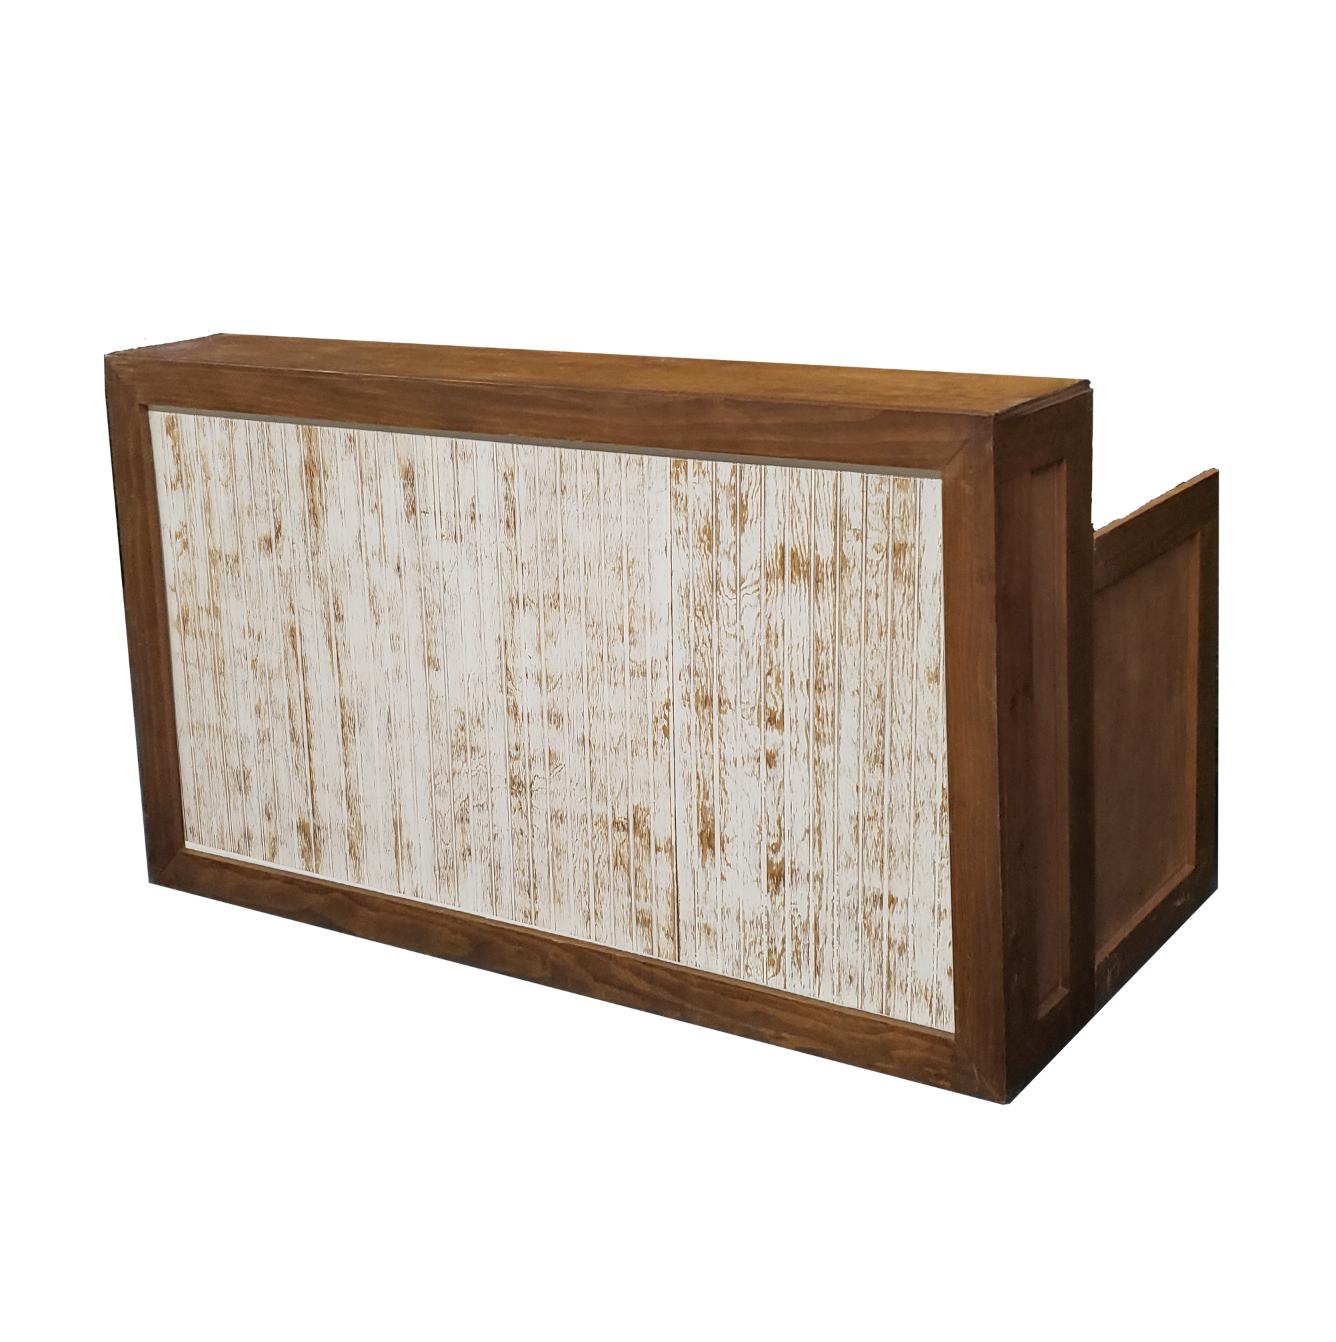 Wood Frame Bar/White Wash Insert  $200